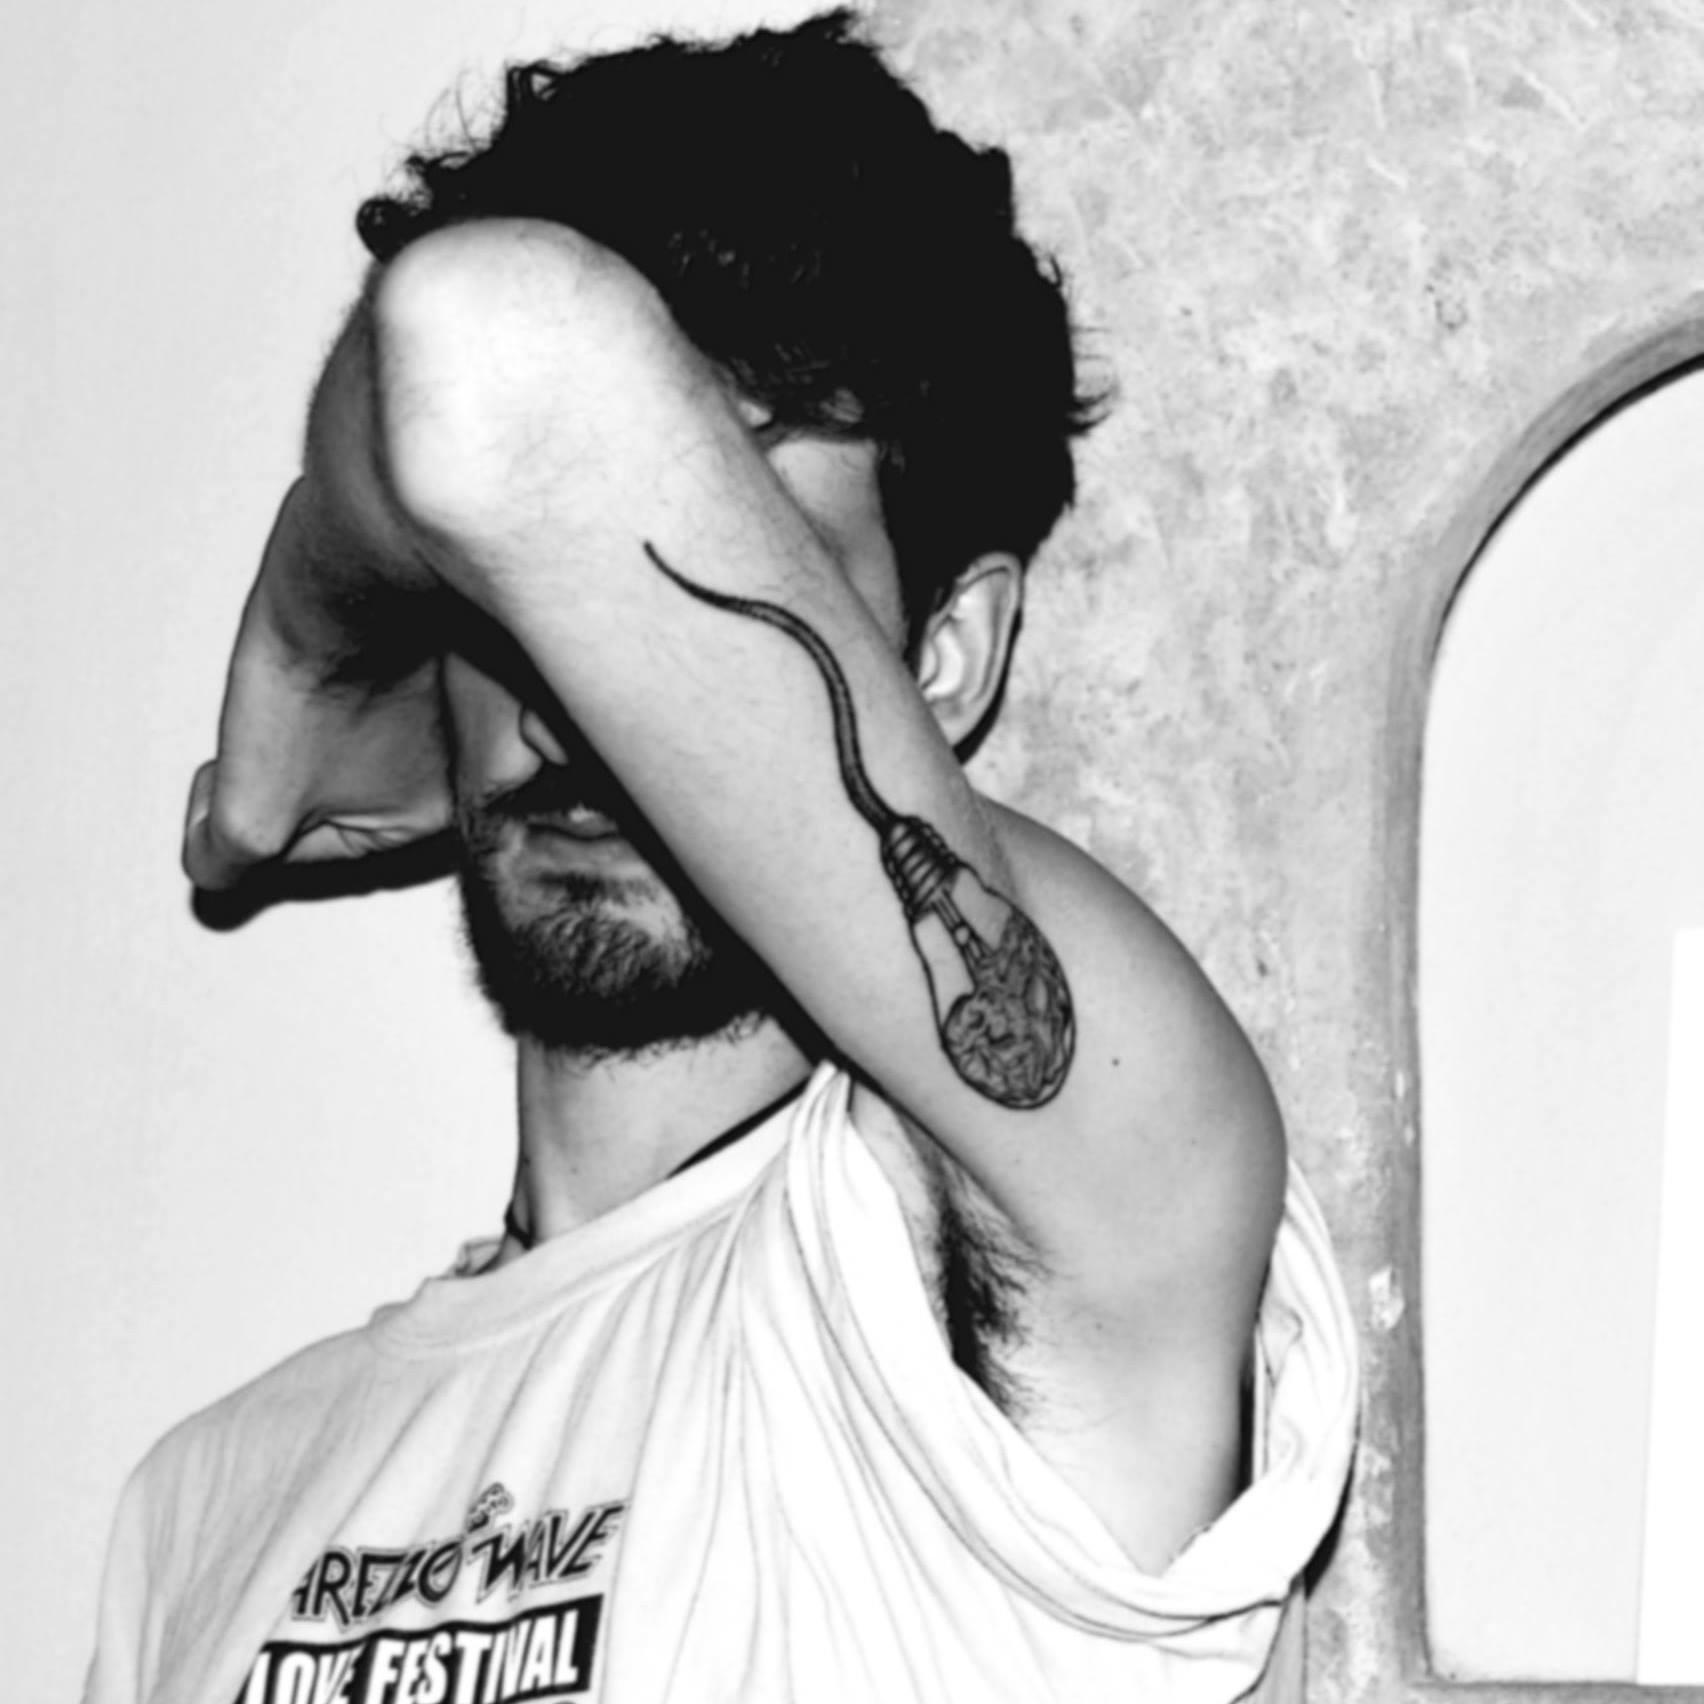 Matteo Bidini